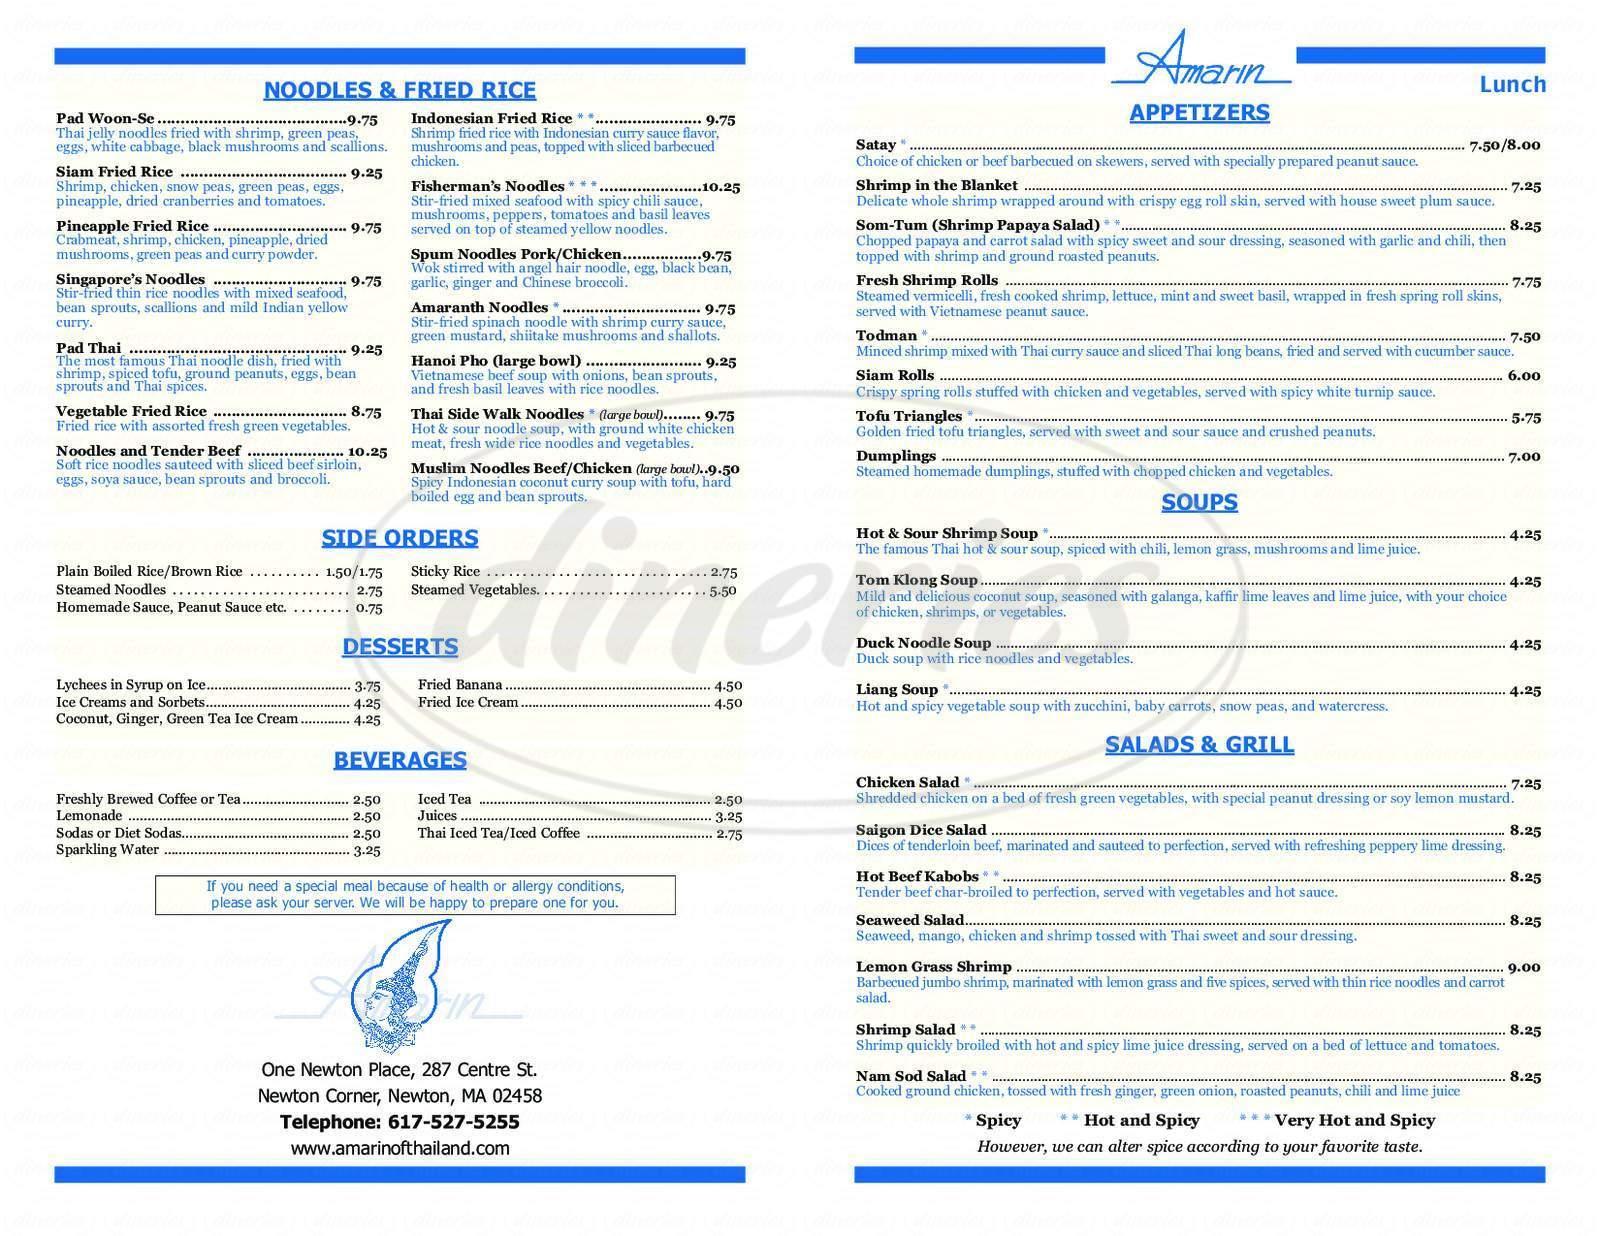 menu for Amarin of Thailand